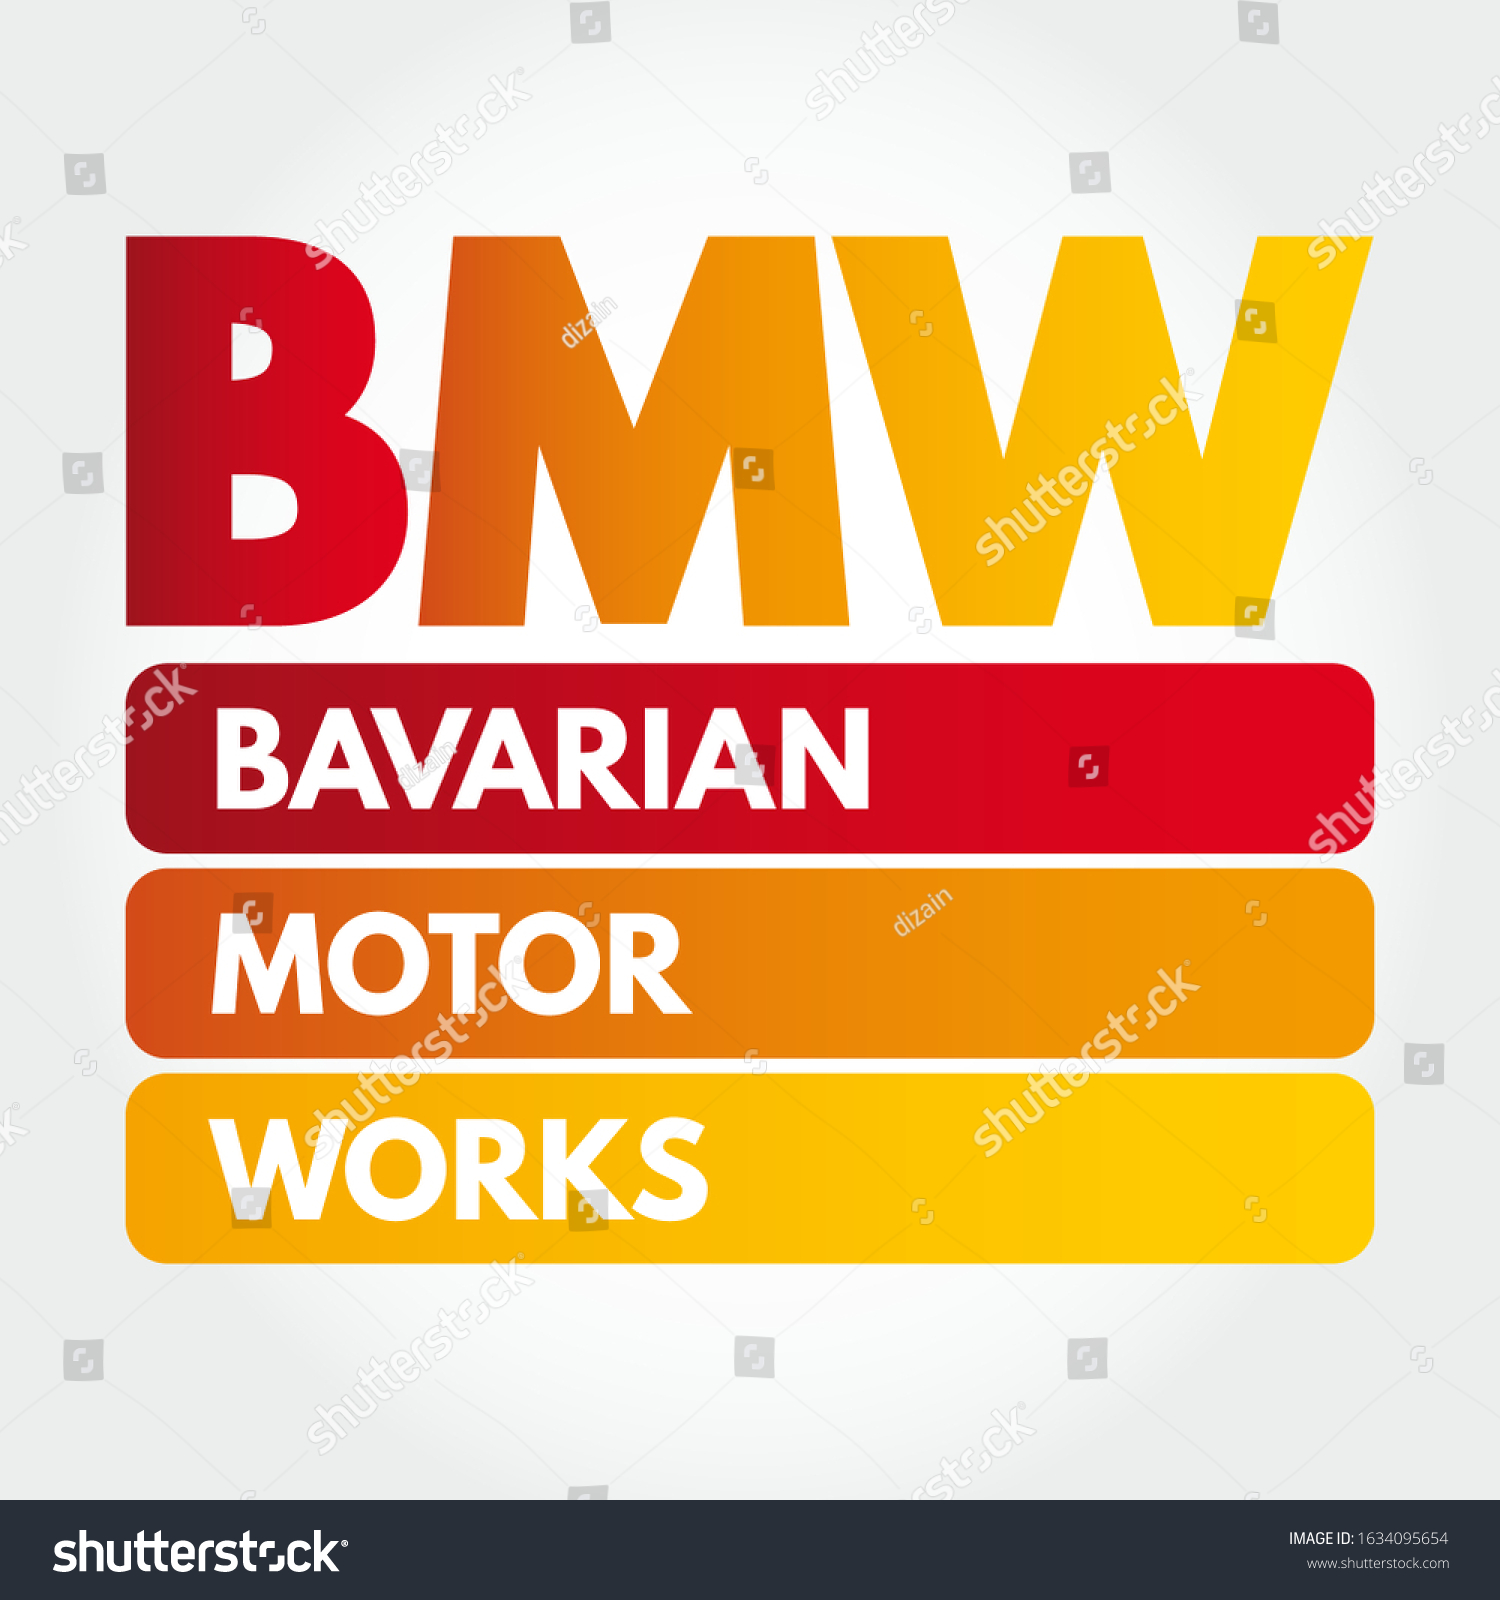 Bmw Bavarian Motor Works Acronym Concept Stock Vector Royalty Free 1634095654